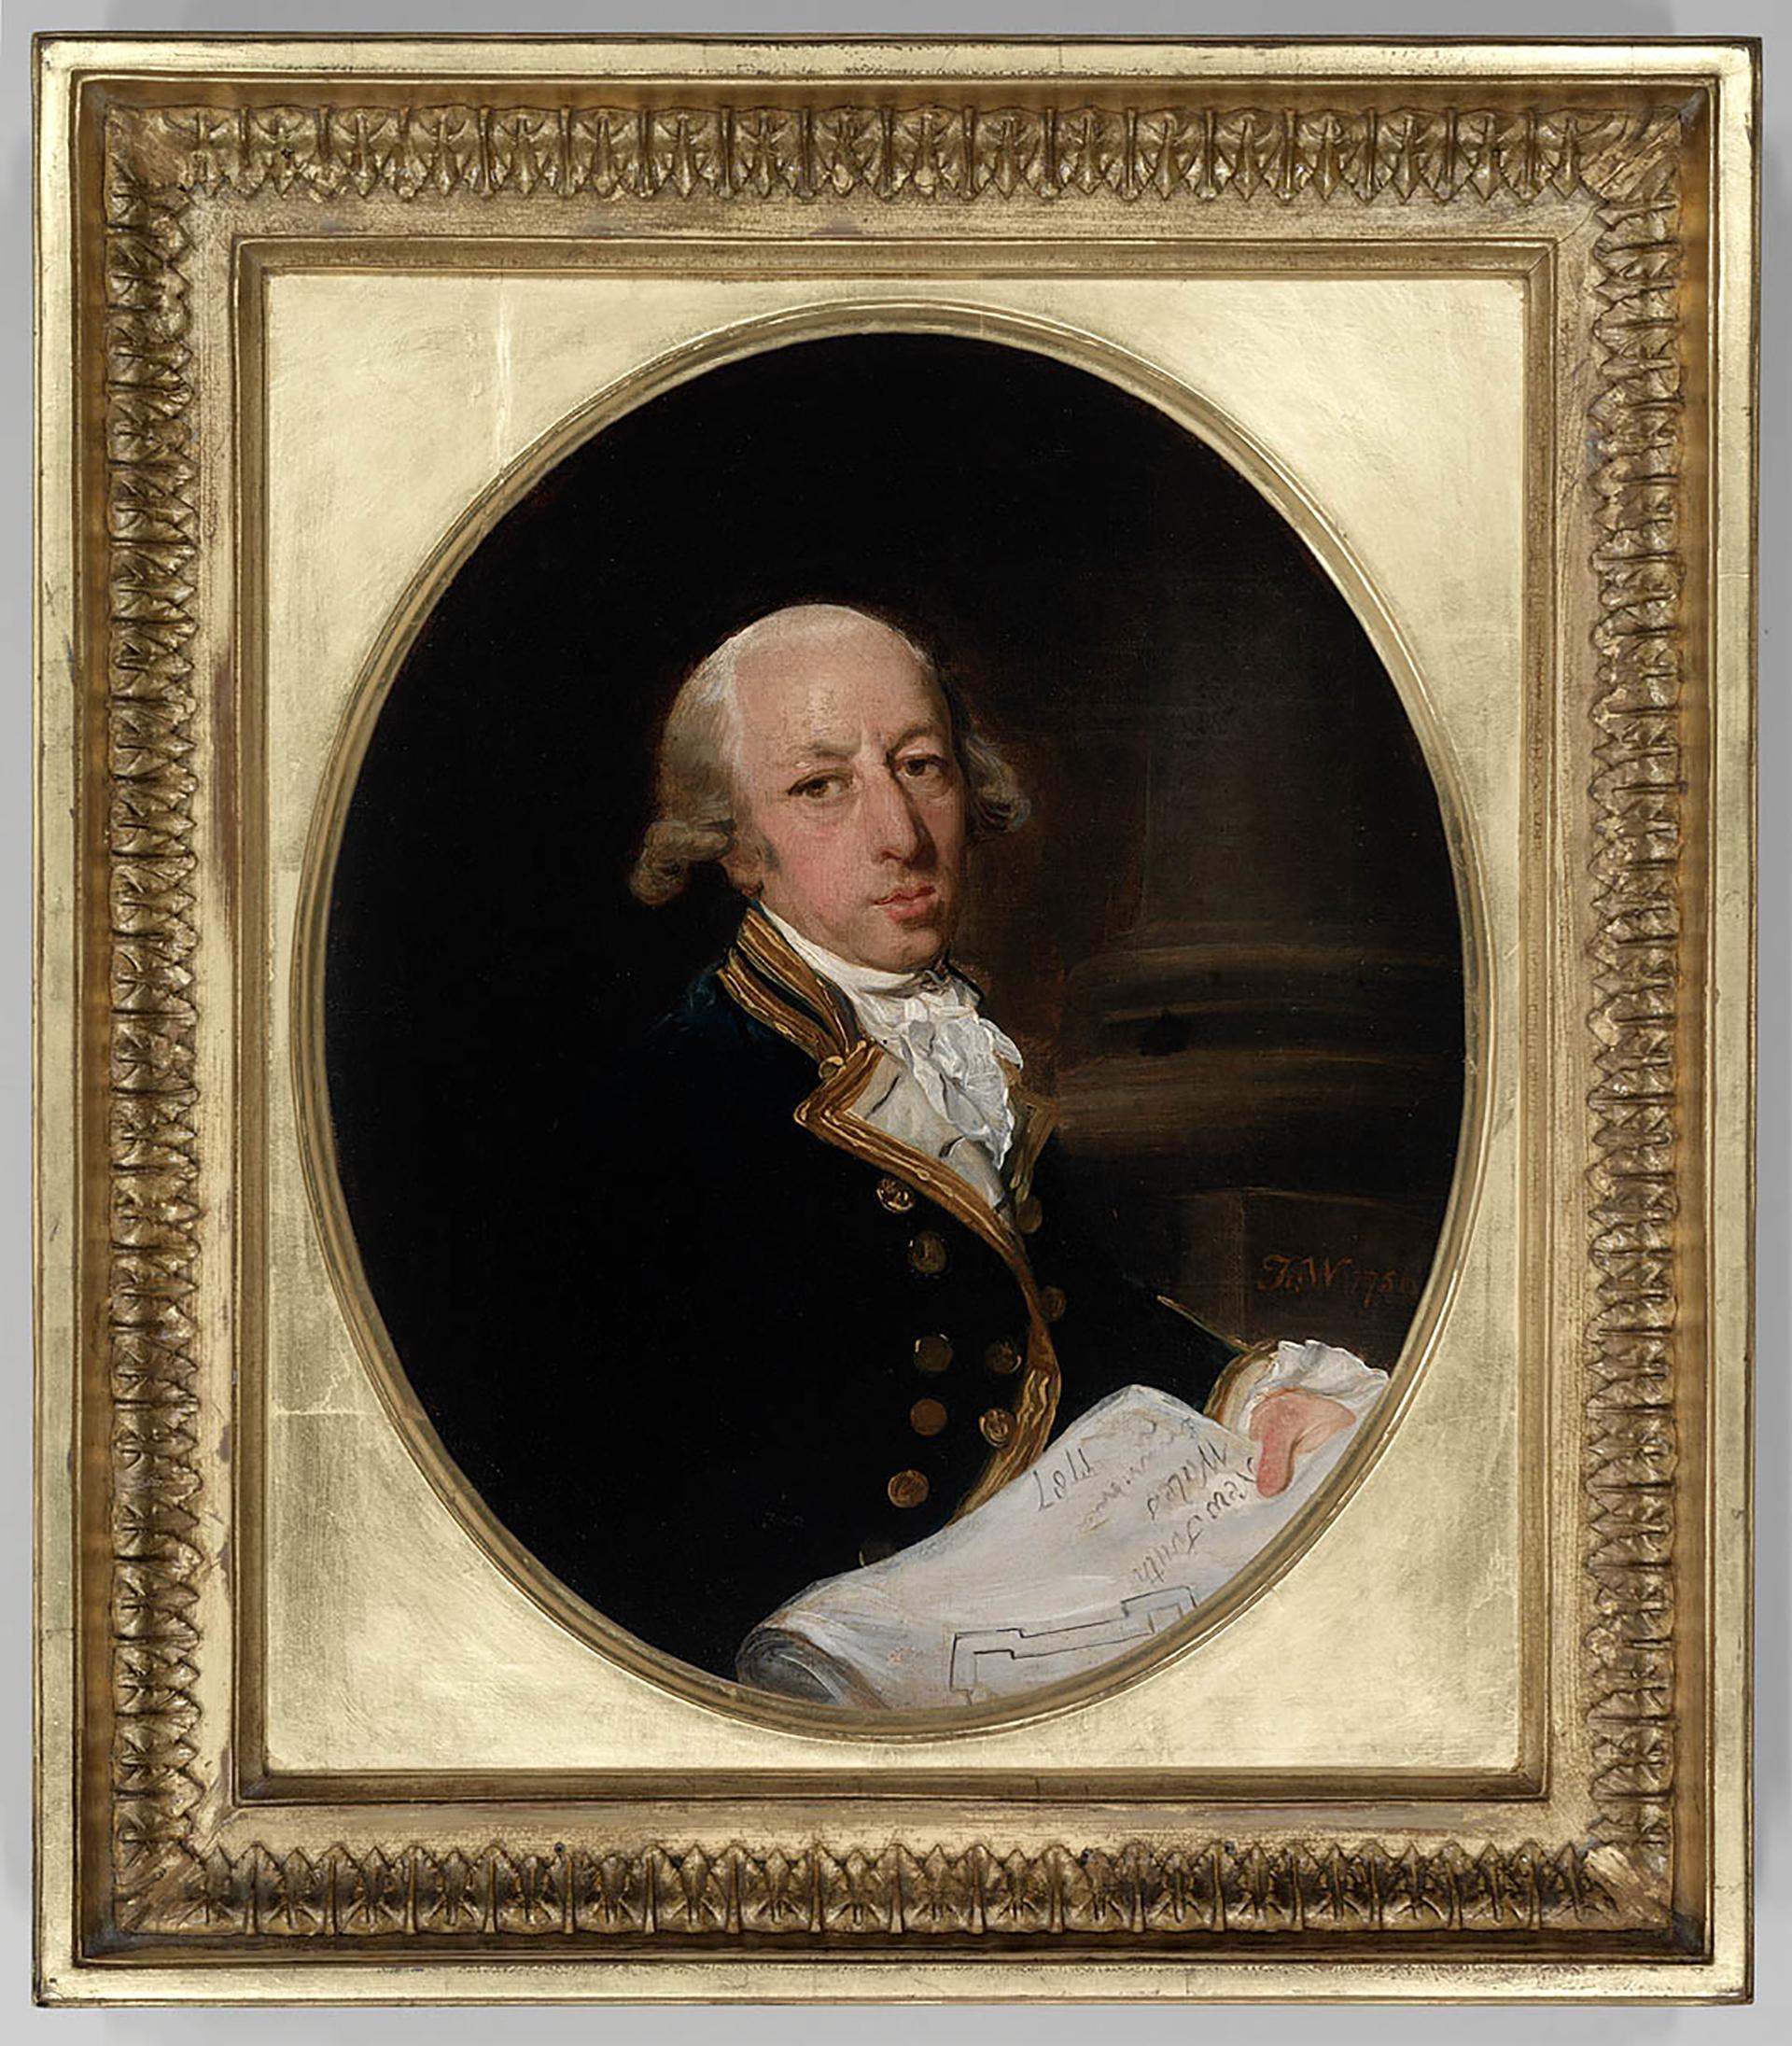 [Captain Arthur Phillip, 1786] / painted by Francis Wheatley